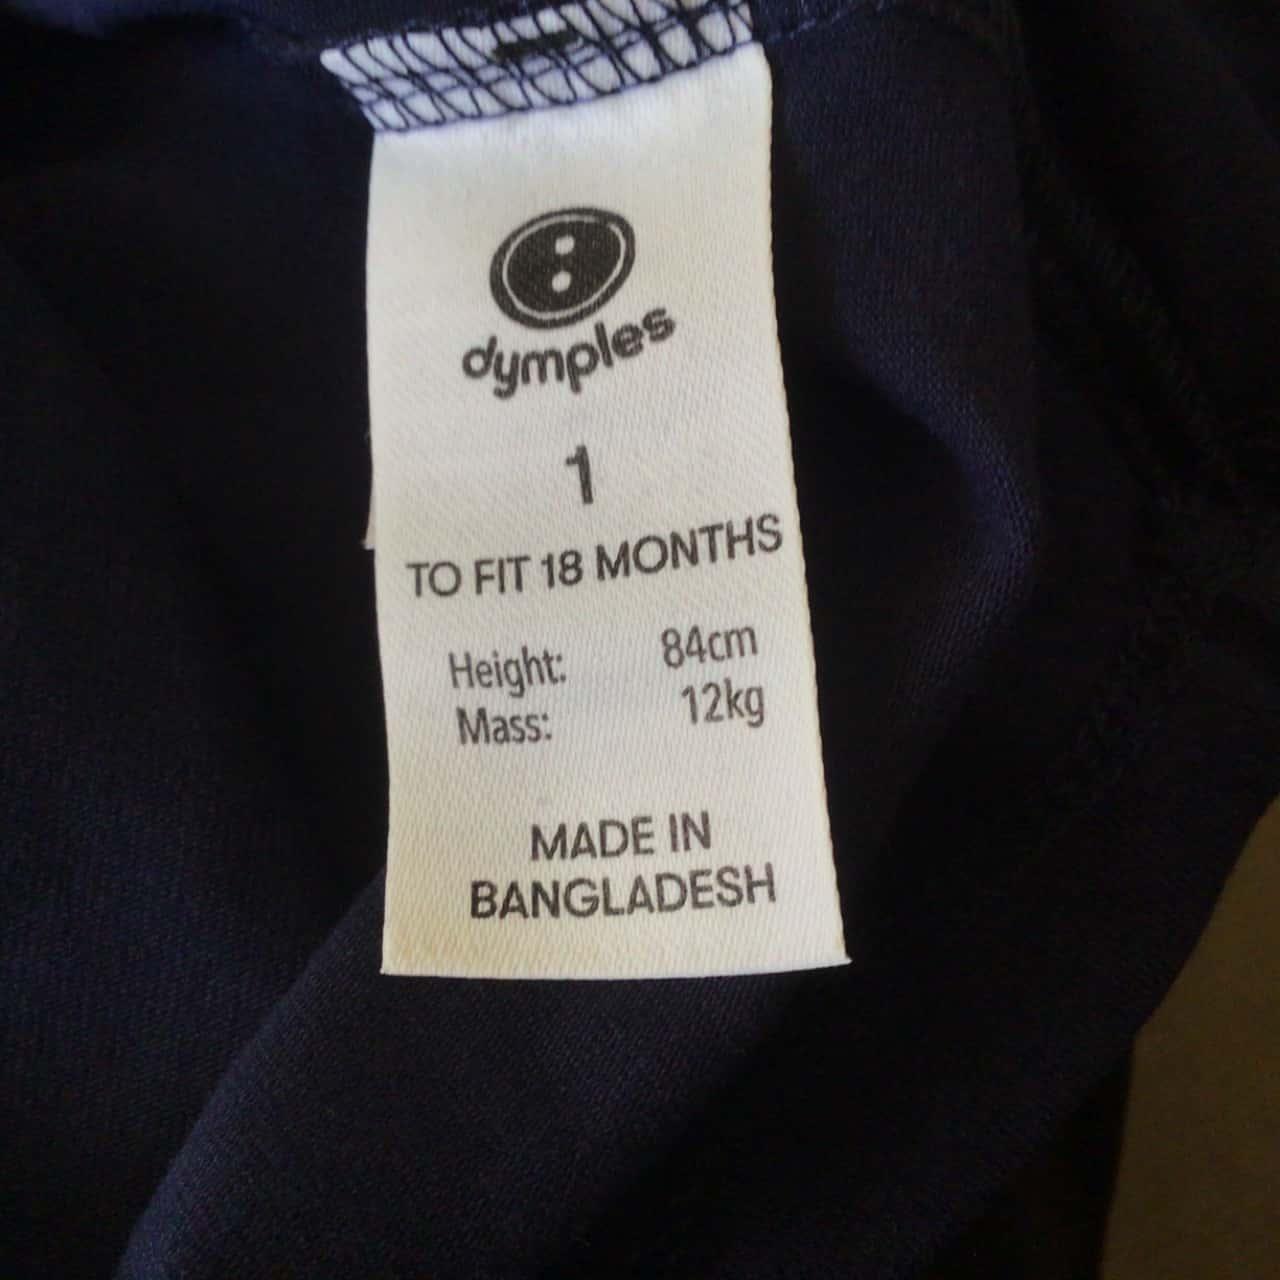 BNWT Toddler Girls DYMPLES NAVY T SHIRT  Size 1 RRP $20